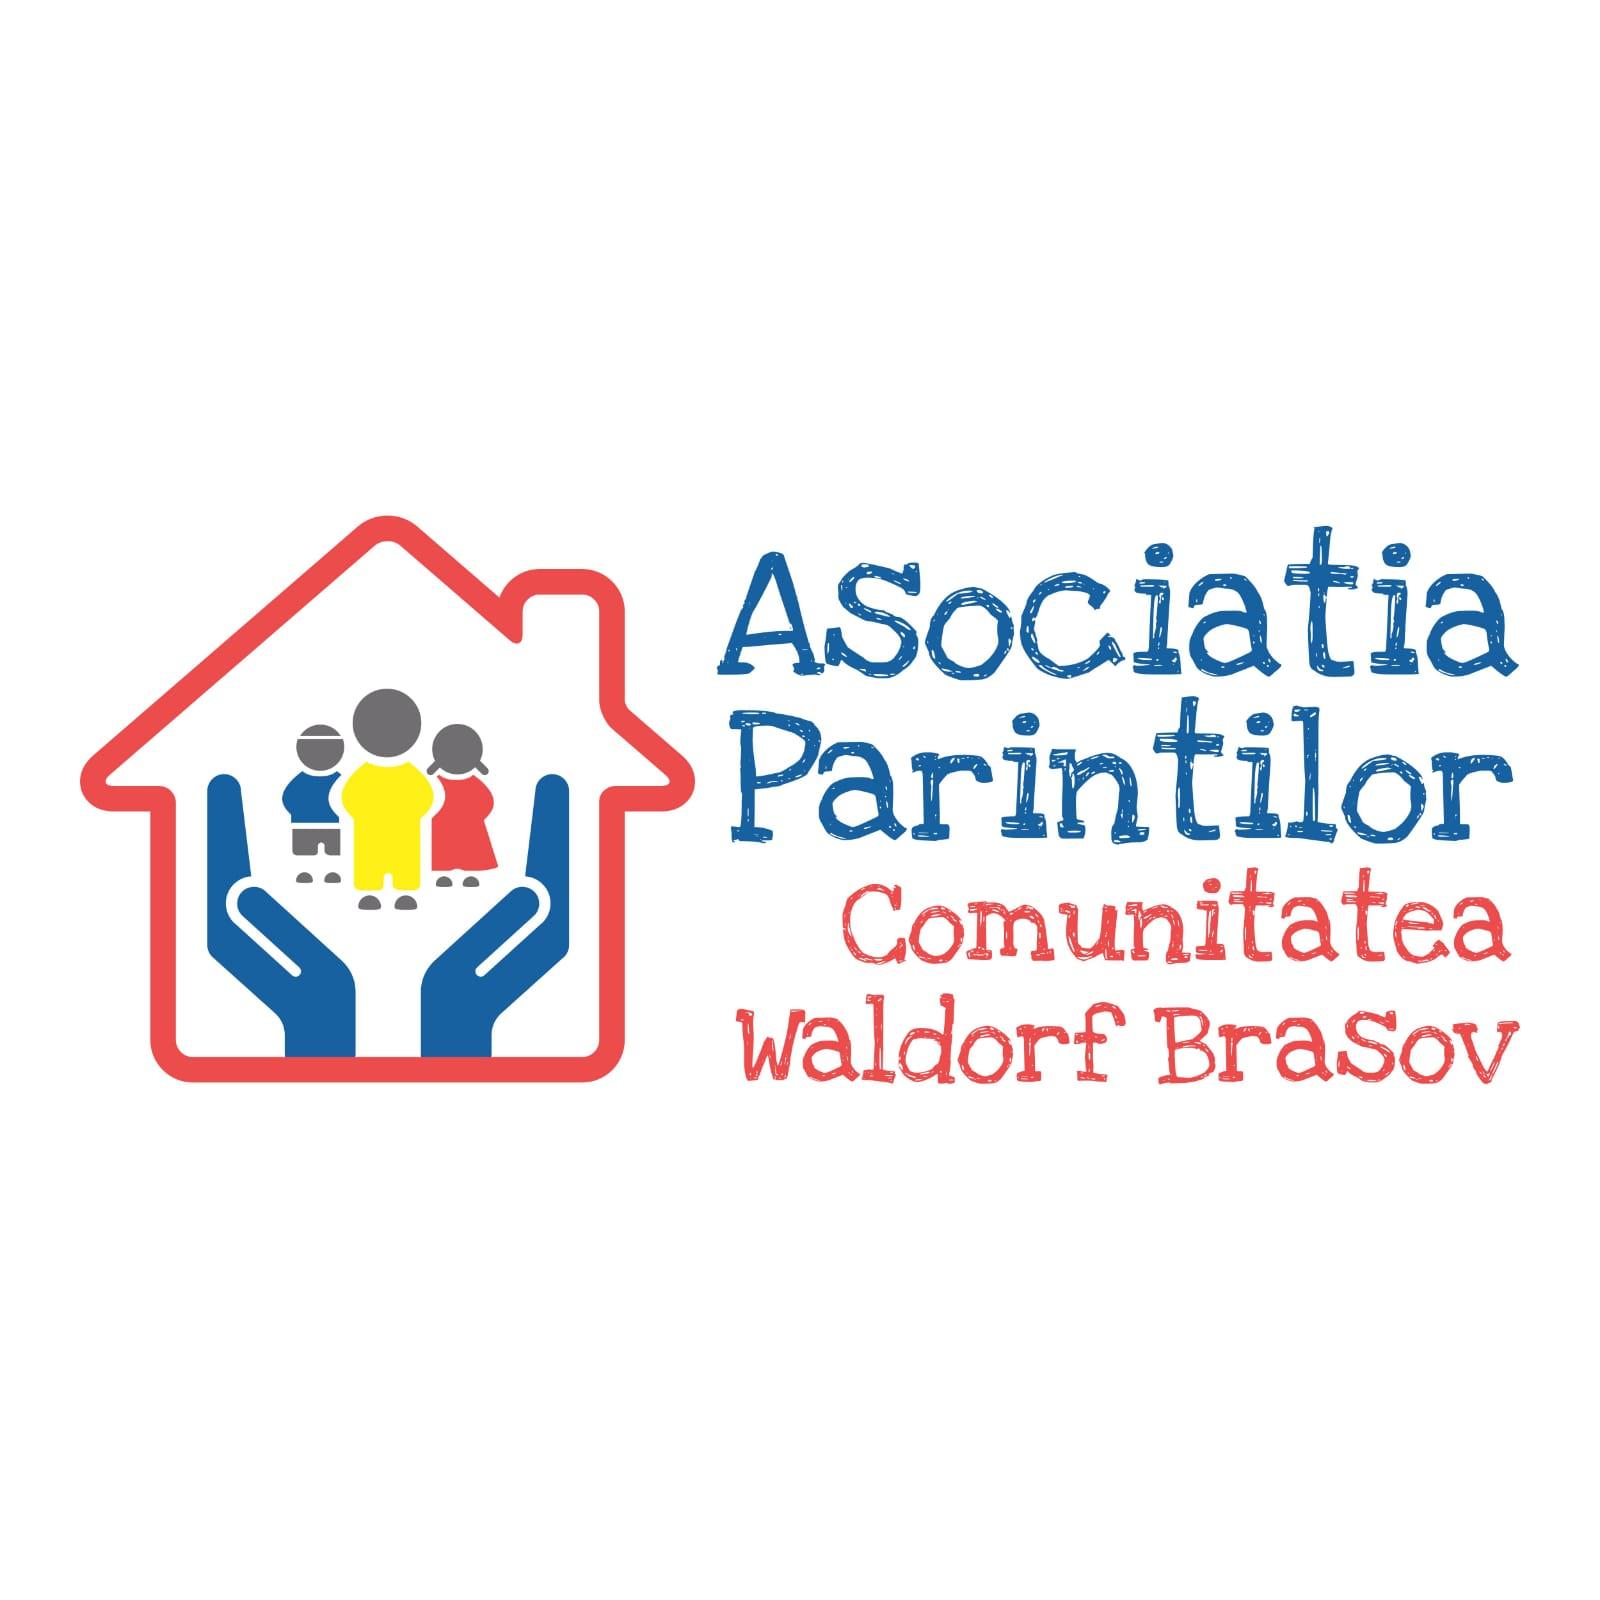 Asociatia Parintilor Comunitatea Waldorf Brasov logo